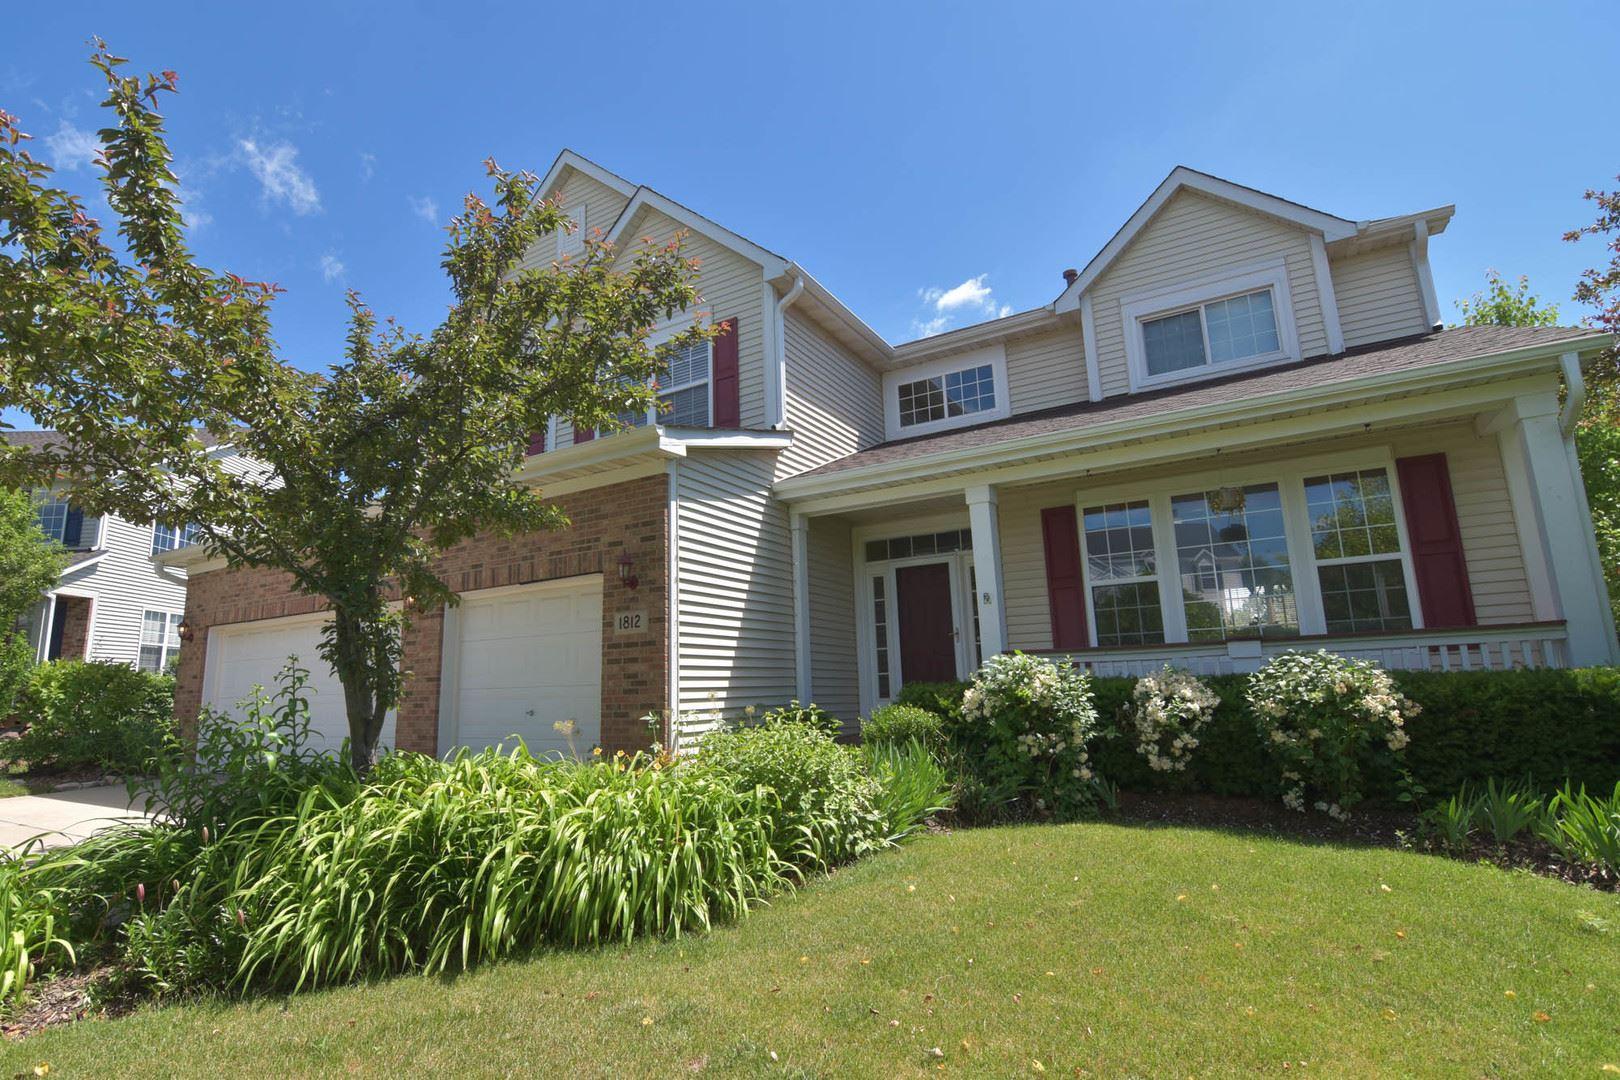 1812 Prairie Ridge Circle, Lindenhurst, IL 60046 - #: 10750527